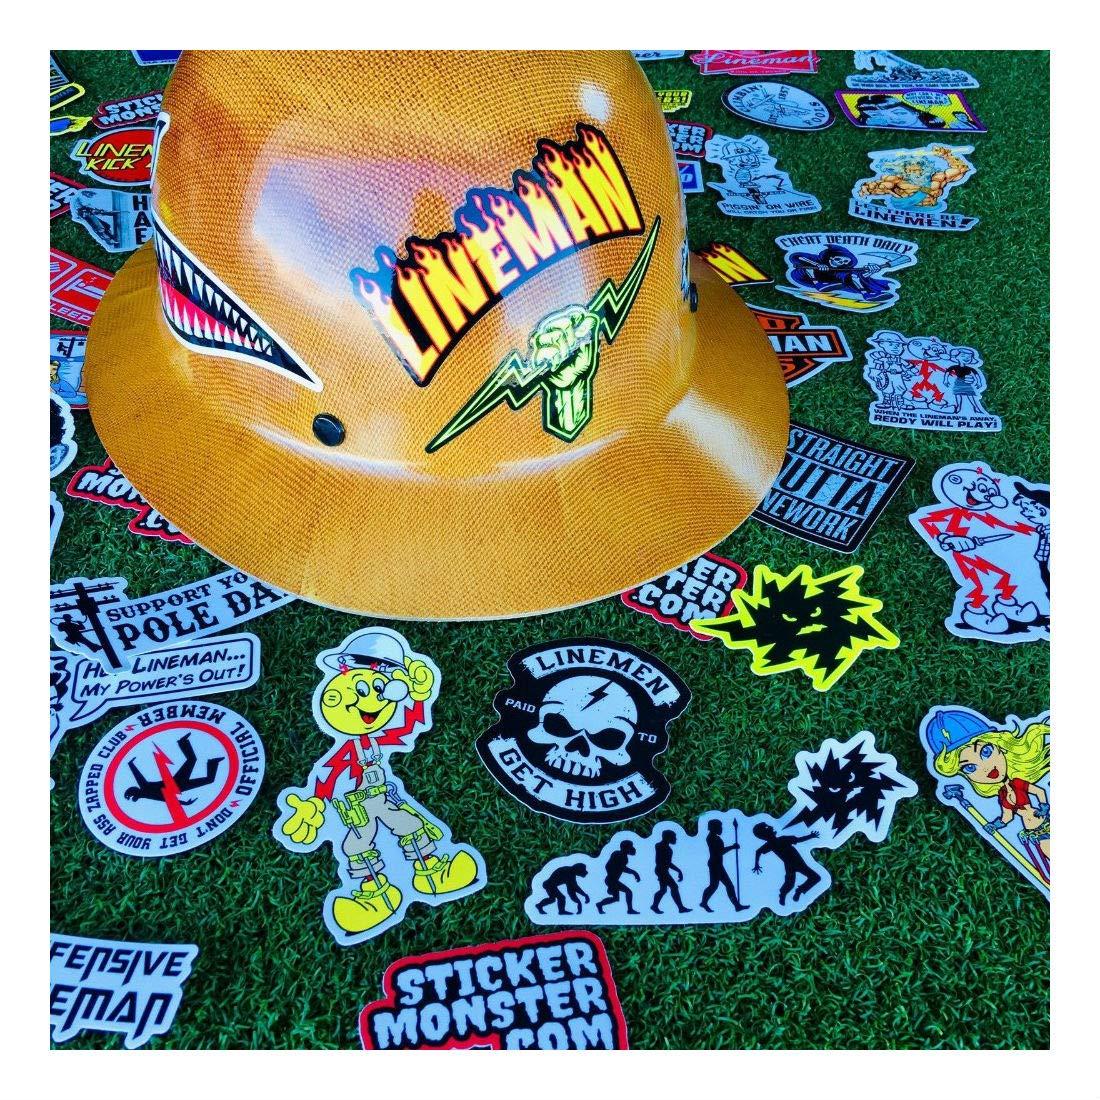 Lineman (64) Hard Hat Stickers Hardhat Sticker, Linemen, Electrician, Reddy IBEW by Unknown (Image #1)